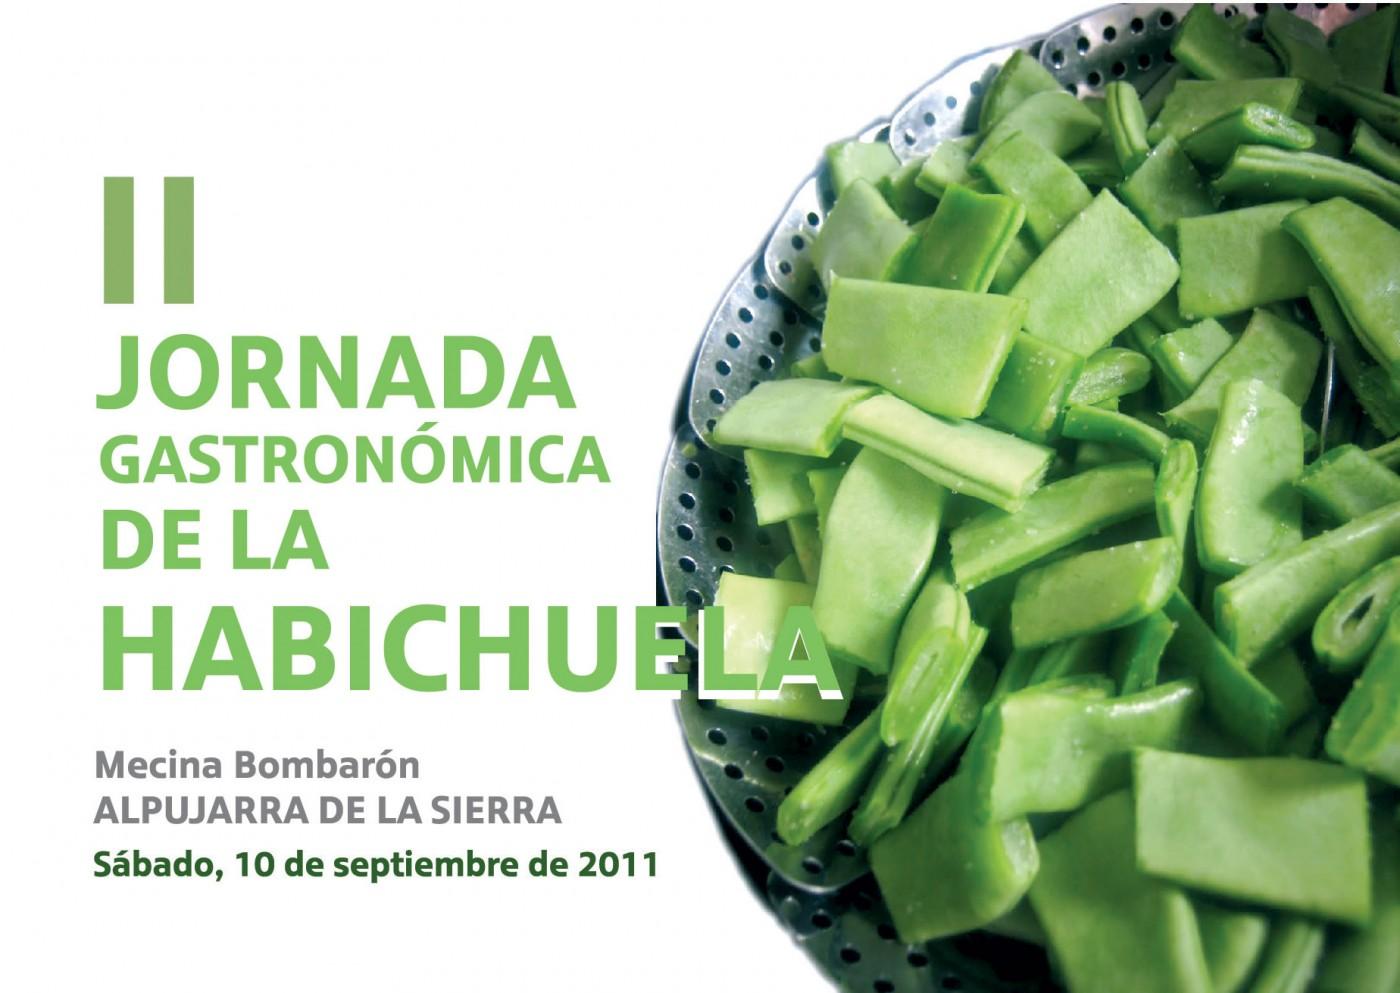 II Jornada Gastronómica de la Habichuela